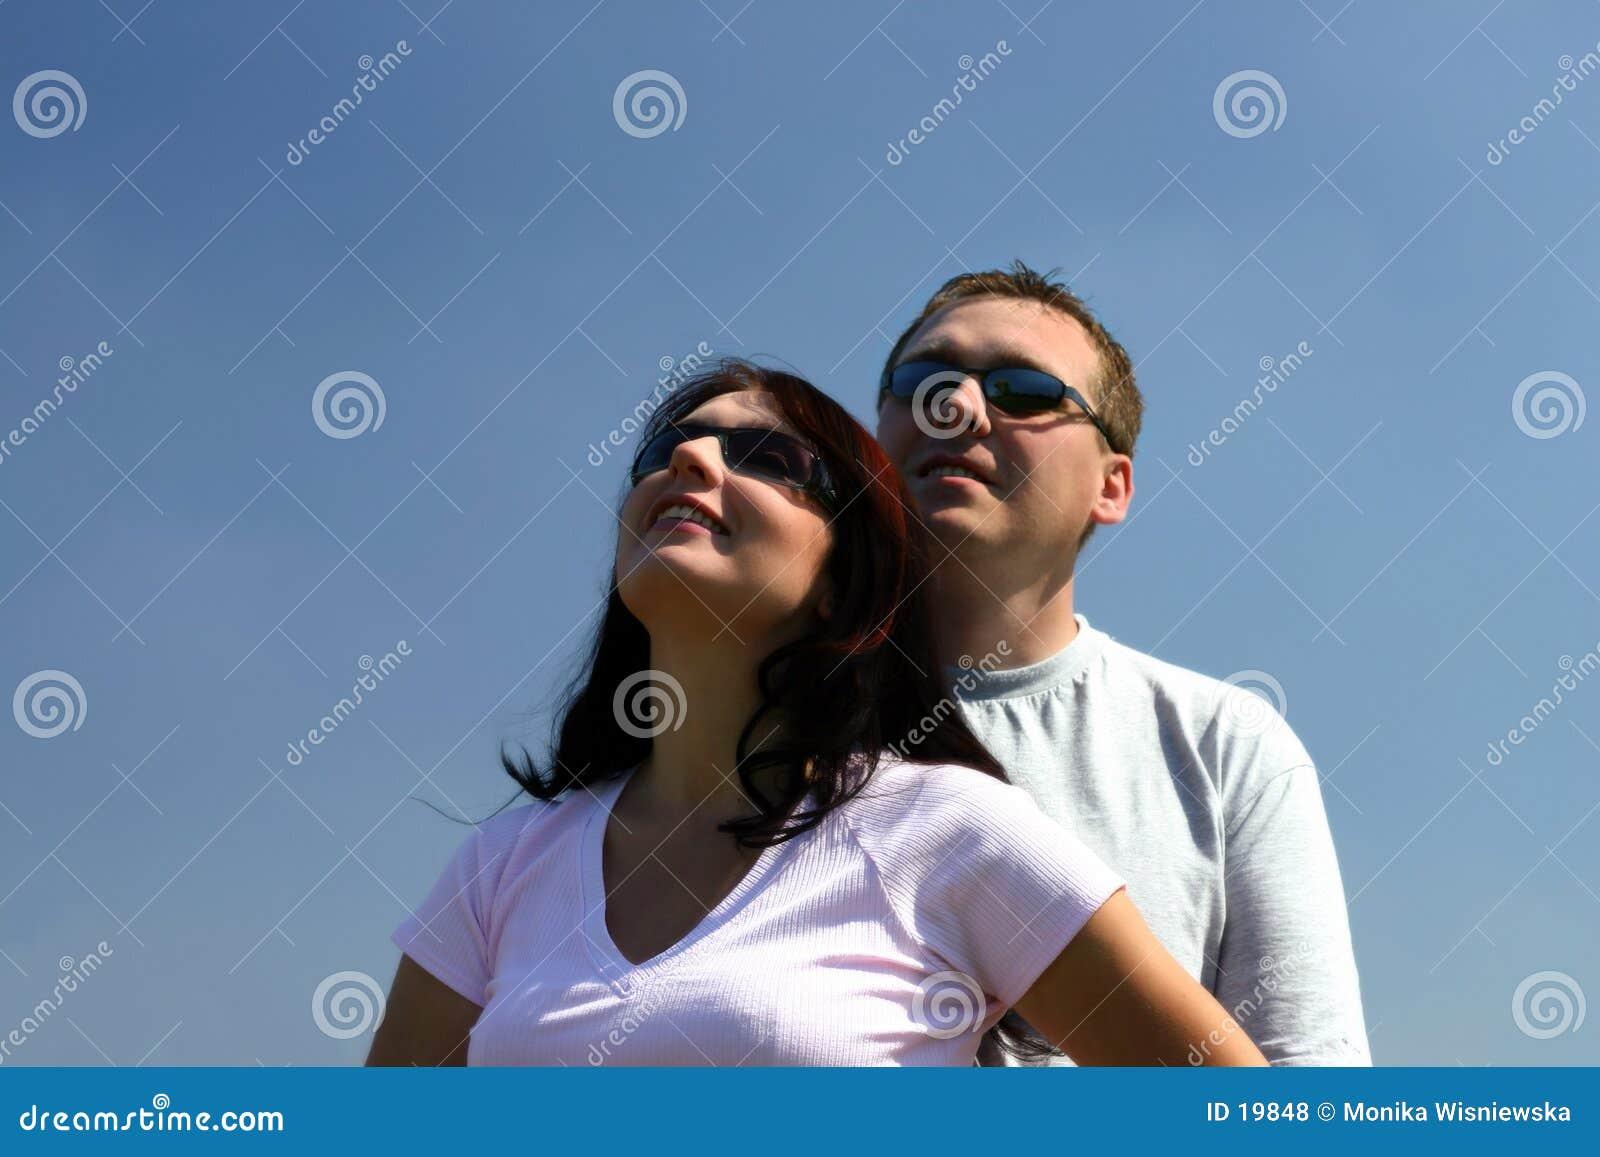 People - Looking up